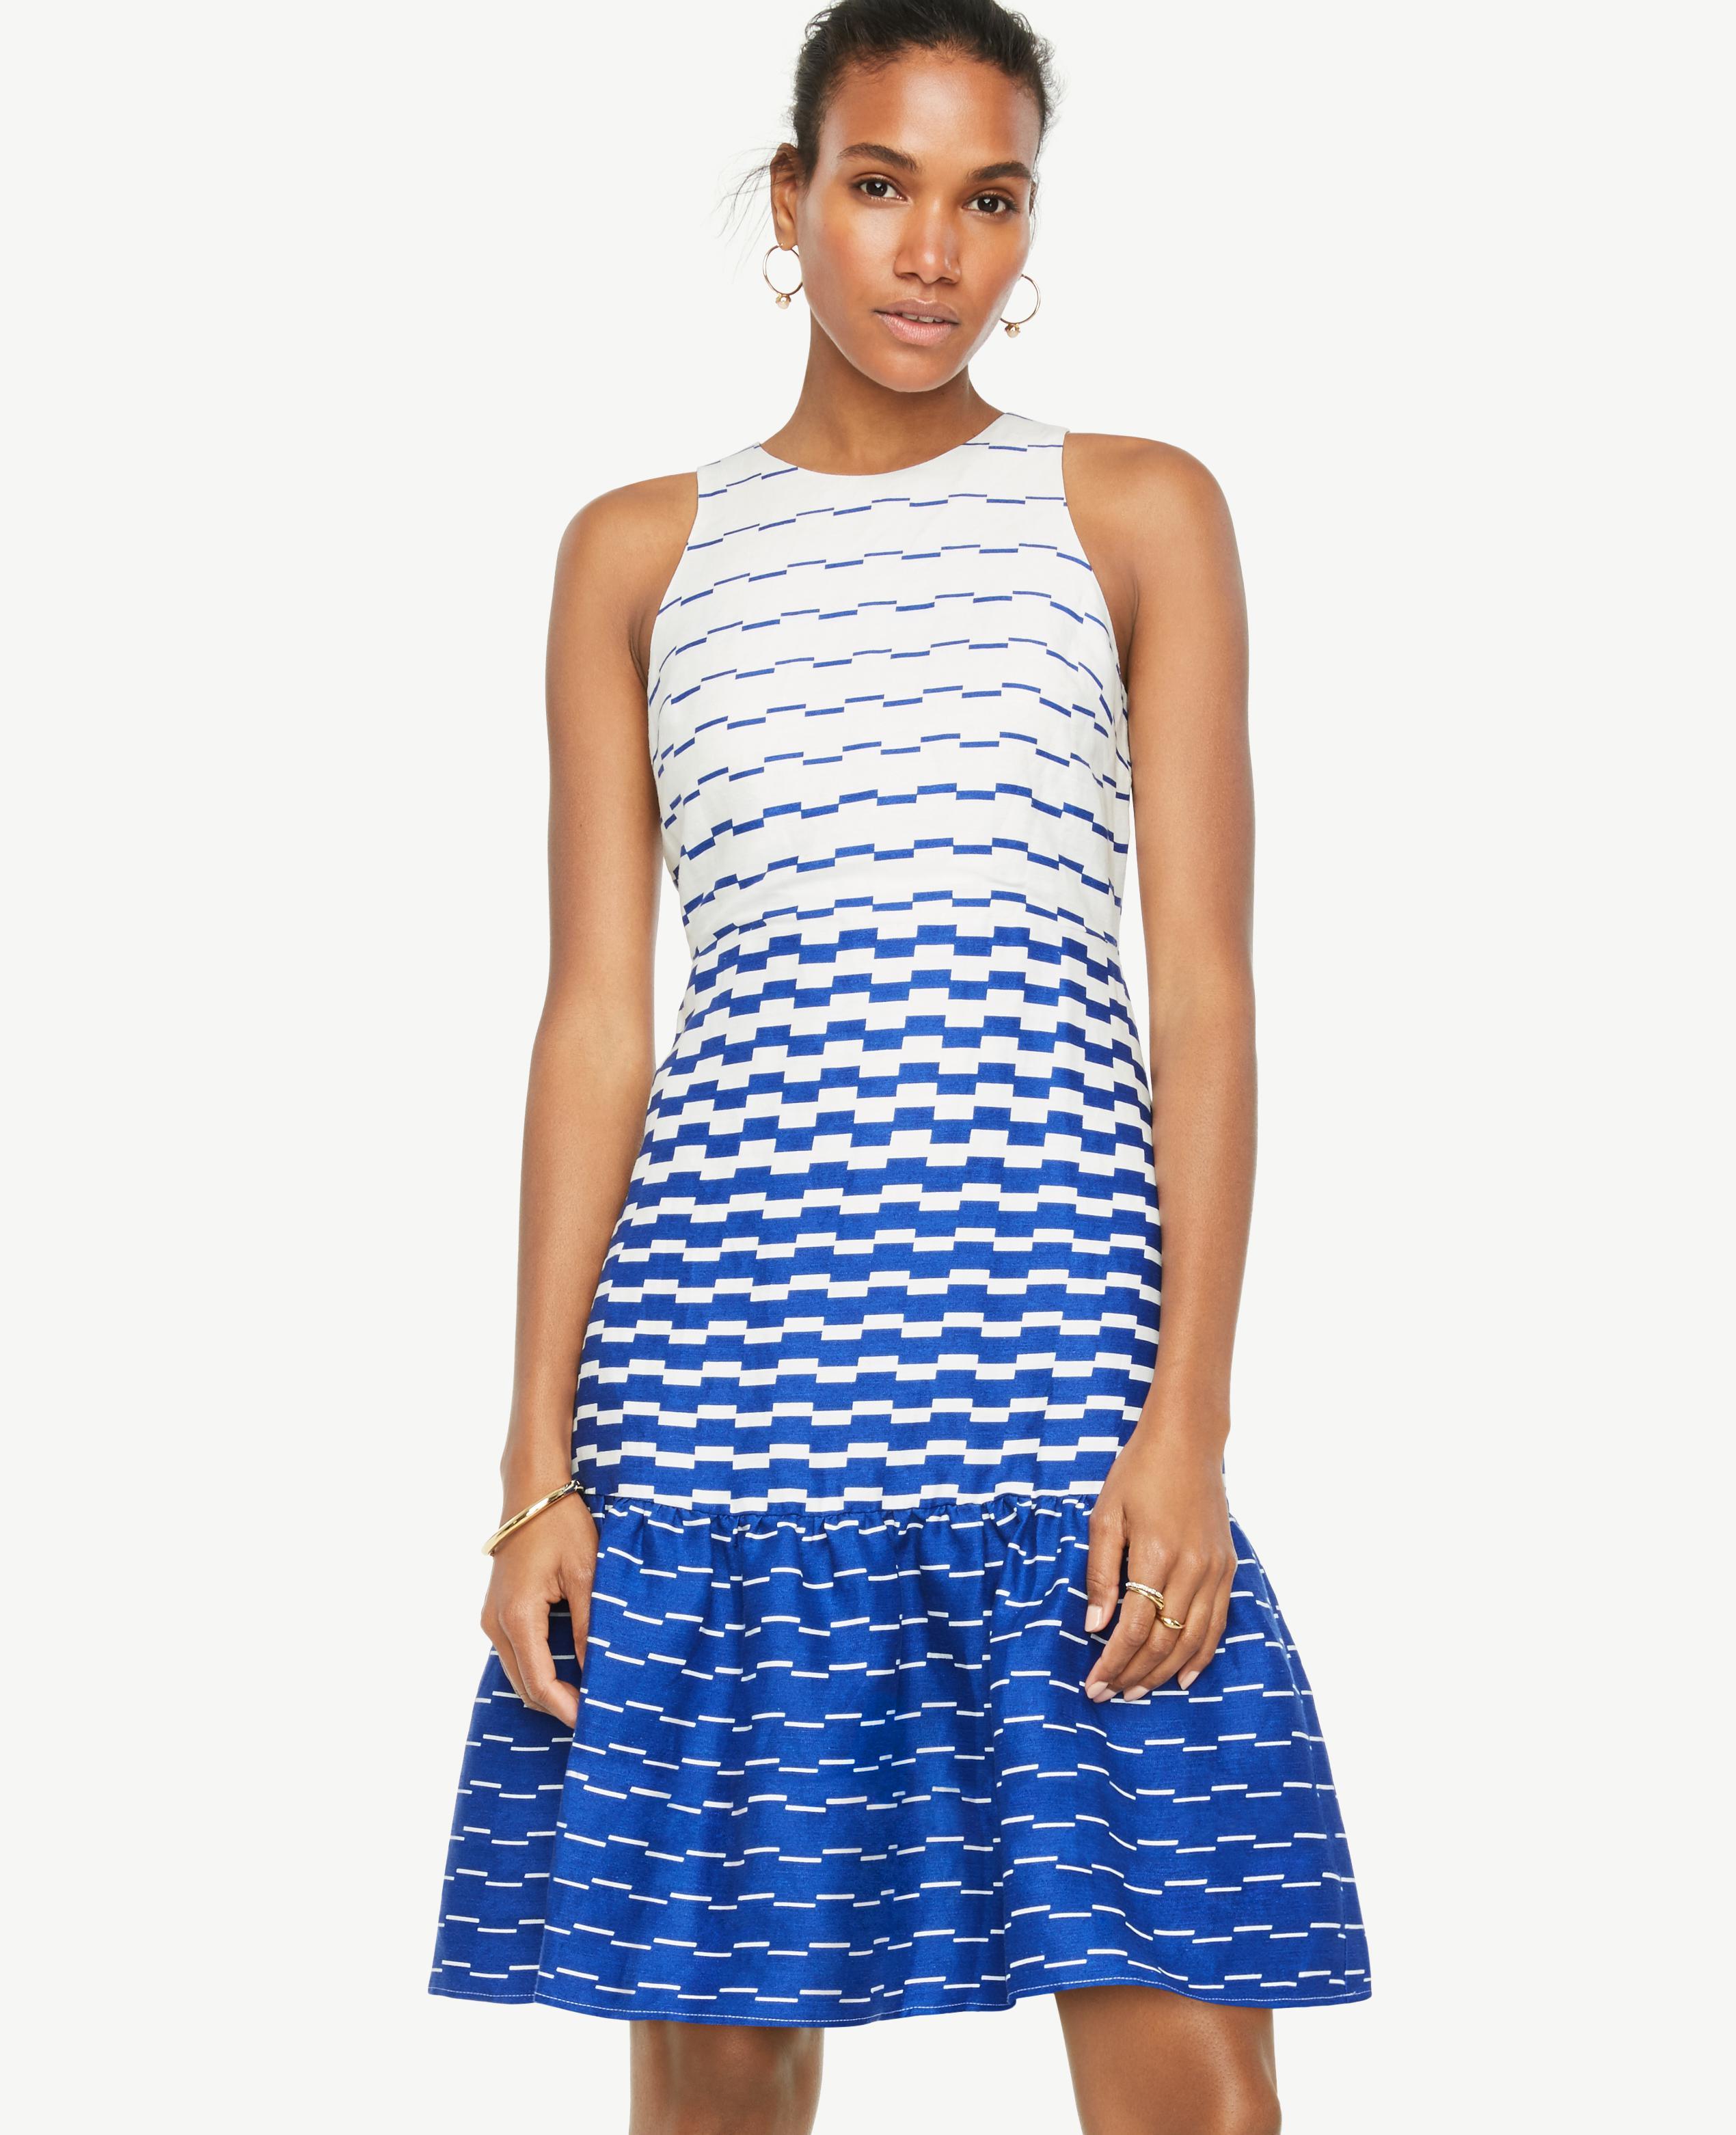 Lyst - Ann Taylor Blurred Stripe Flare Dress in Blue